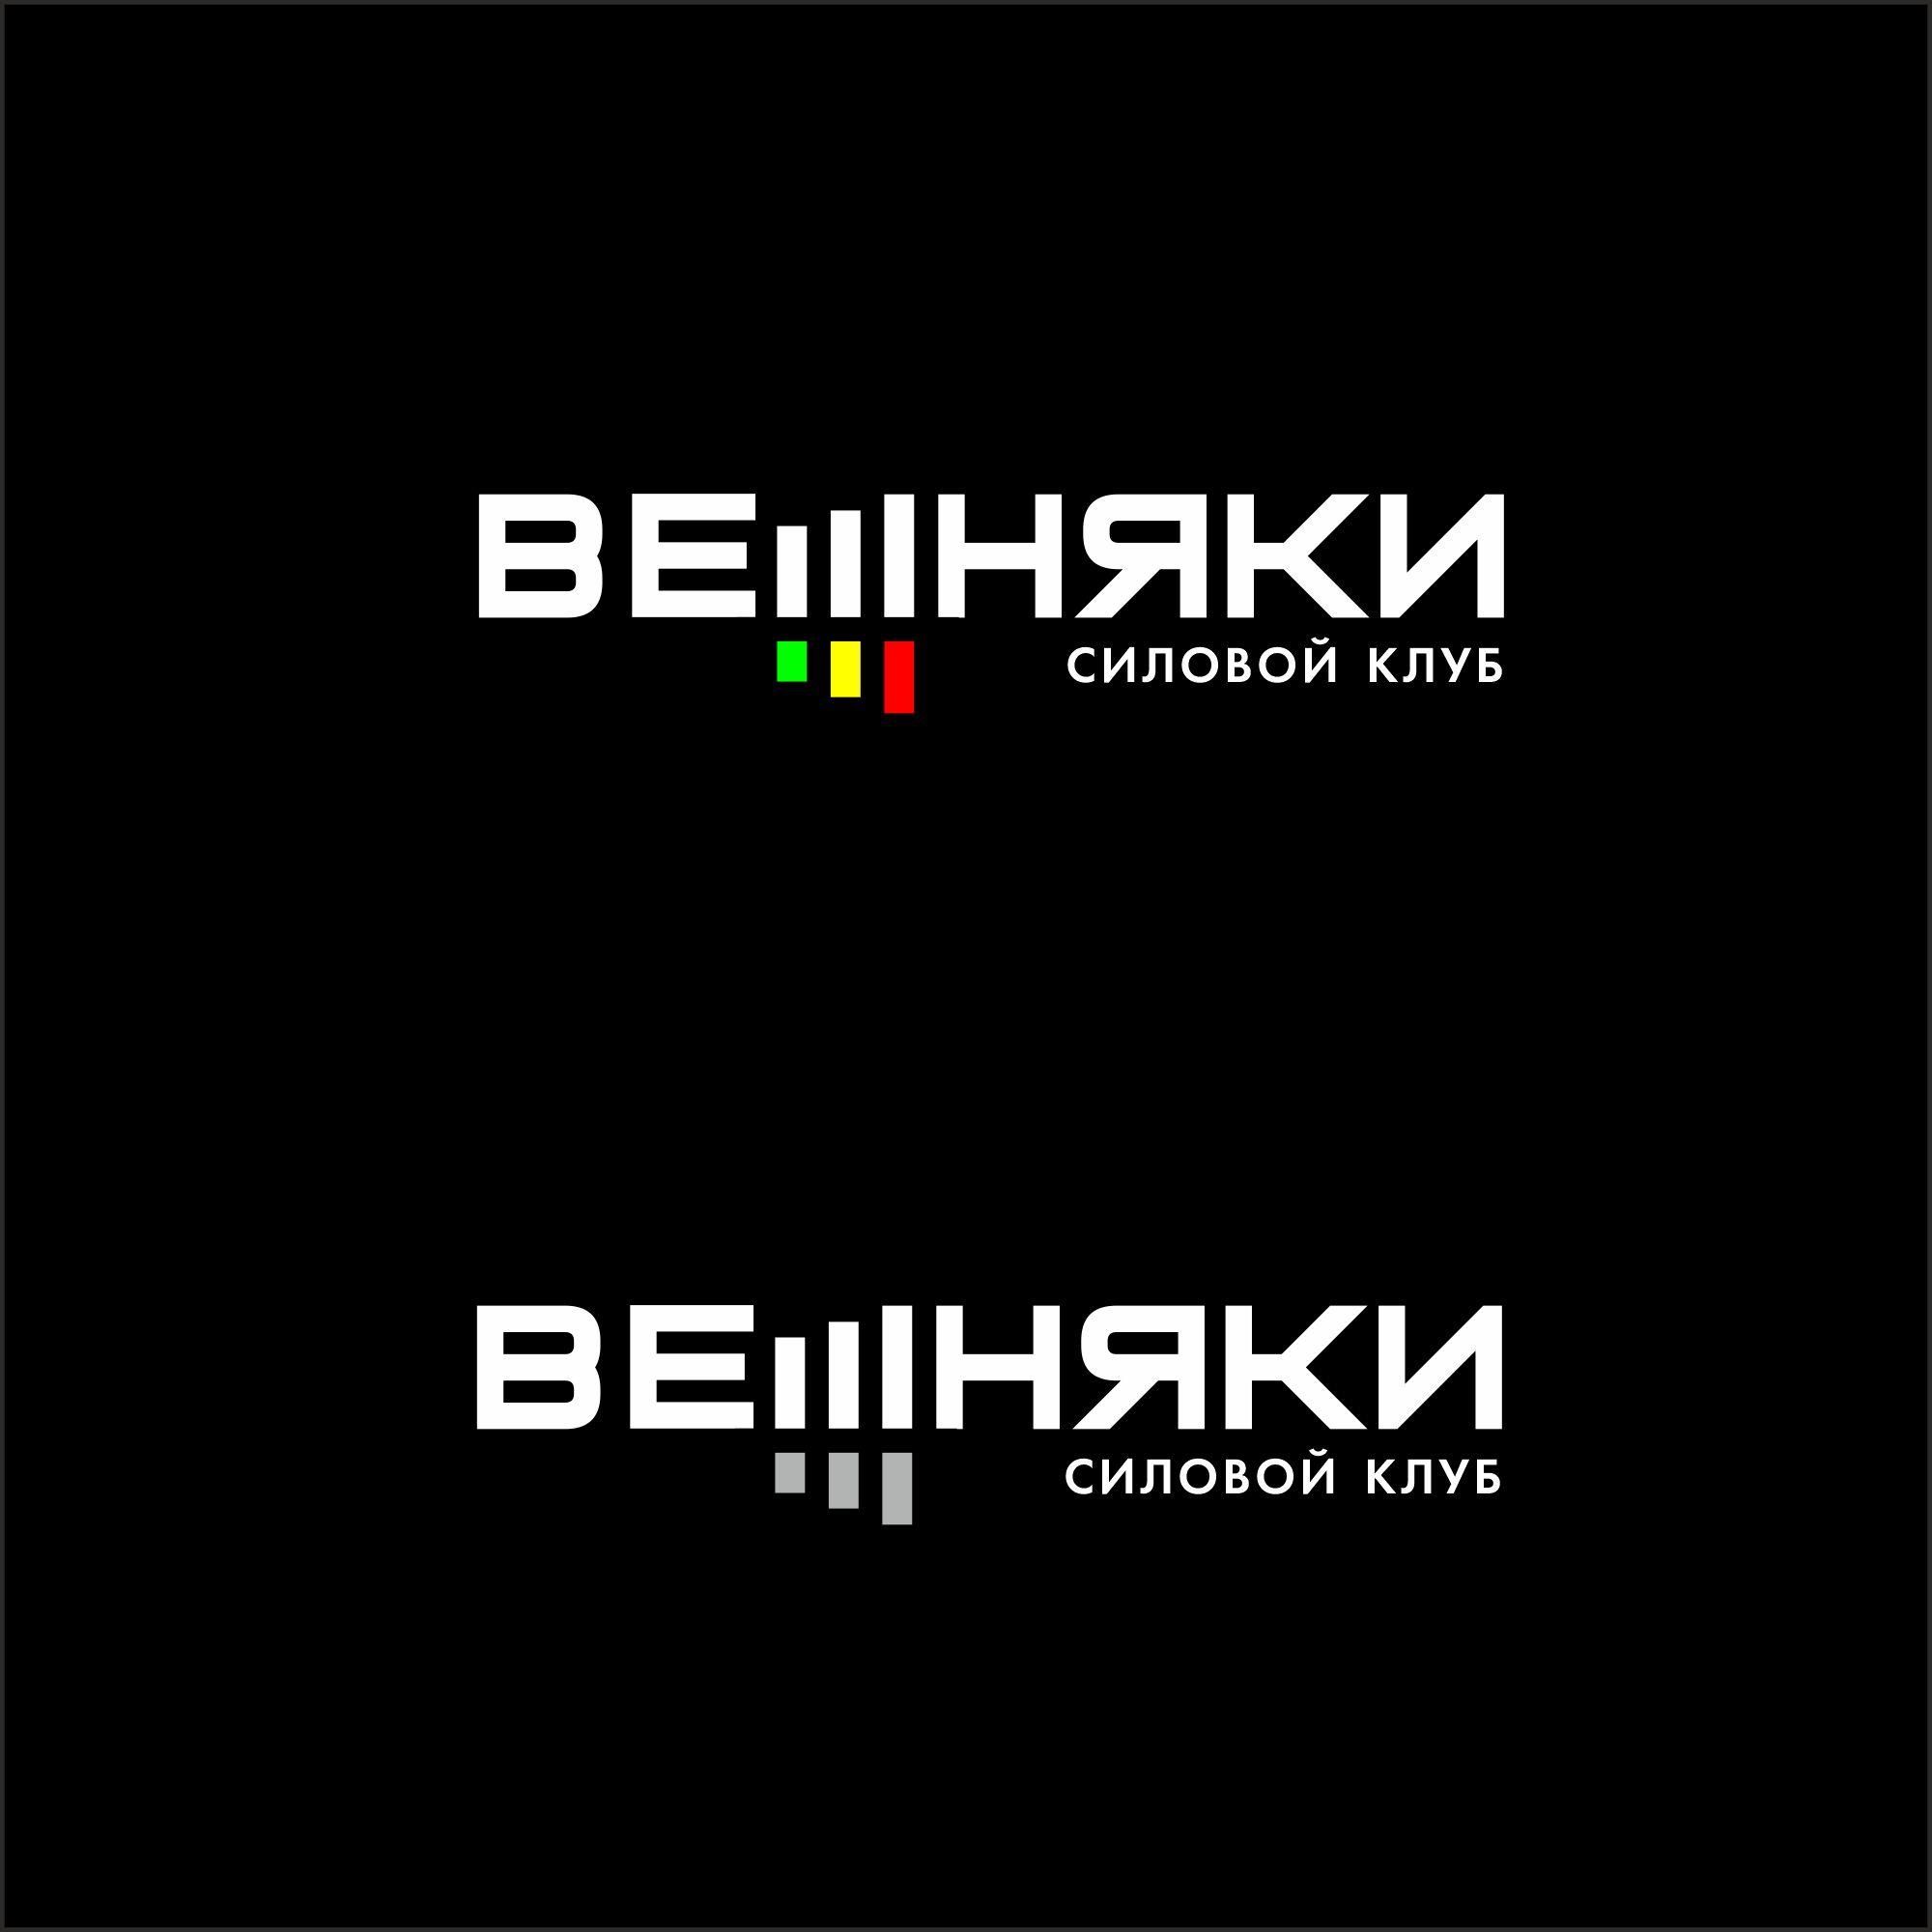 Адаптация (разработка) логотипа Силового клуба ВЕШНЯКИ в инт фото f_1075fba3b828bca0.jpg